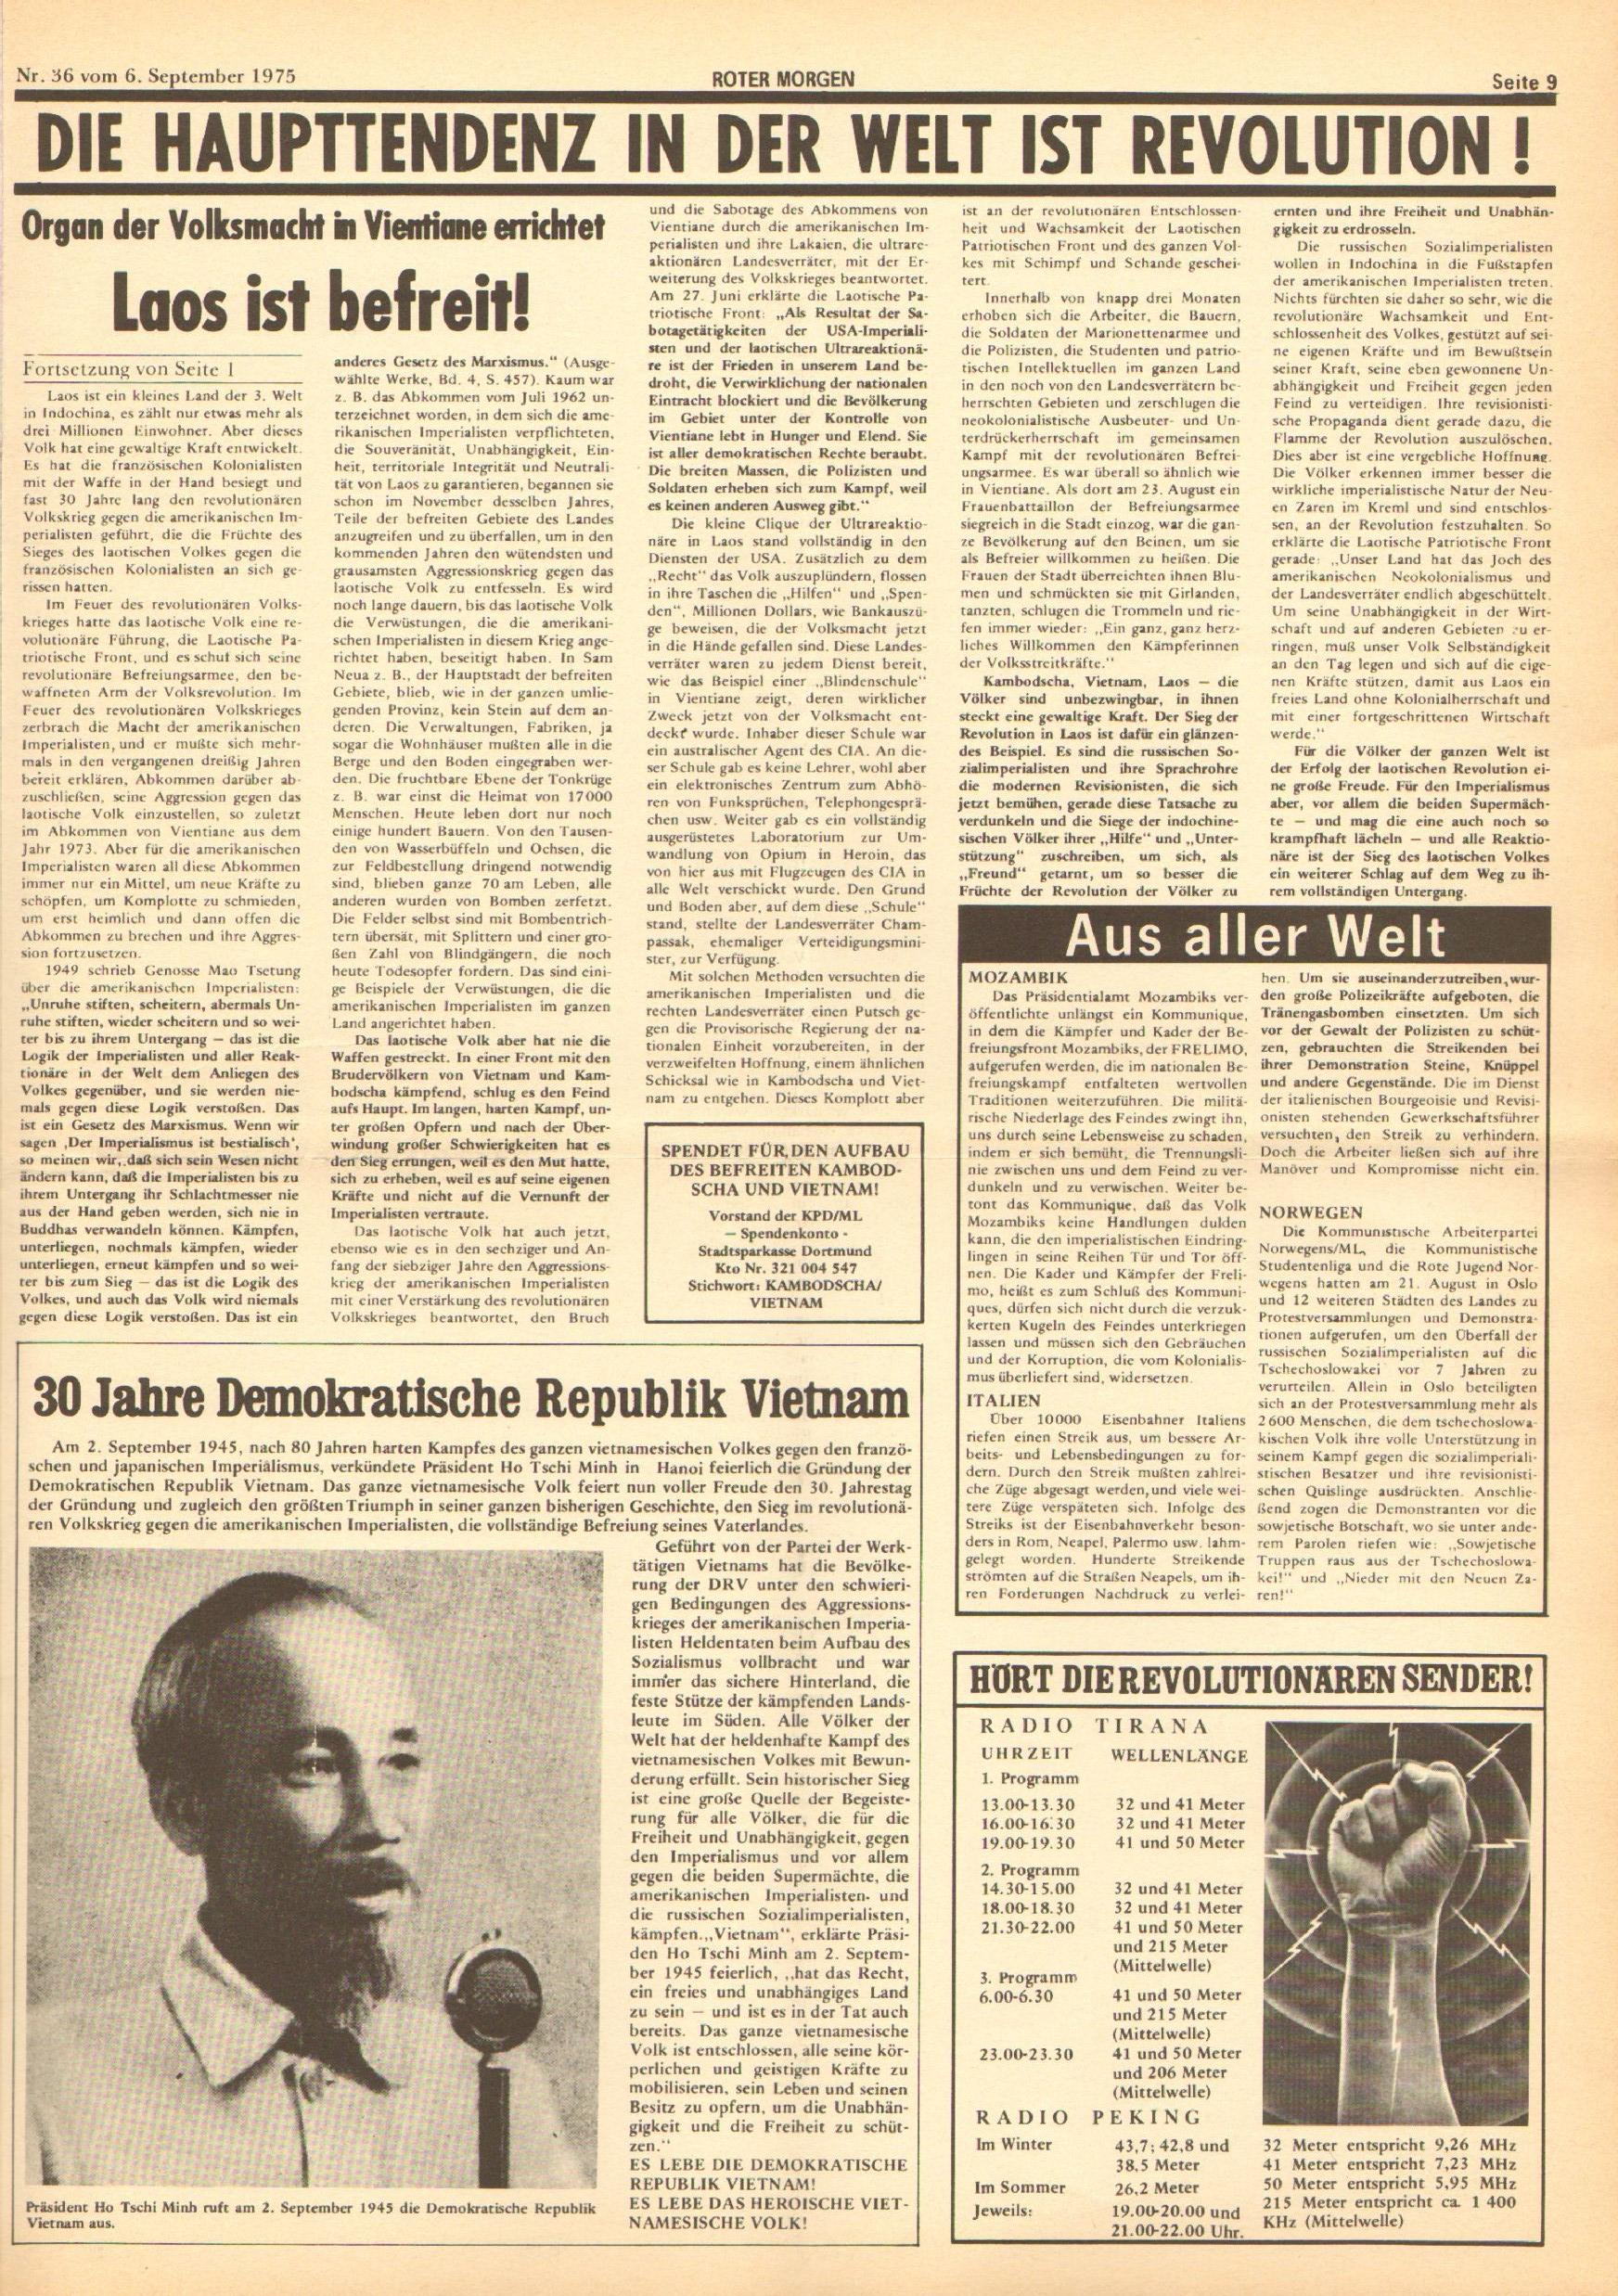 Roter Morgen, 9. Jg., 6. September 1975, Nr. 36, Seite 9